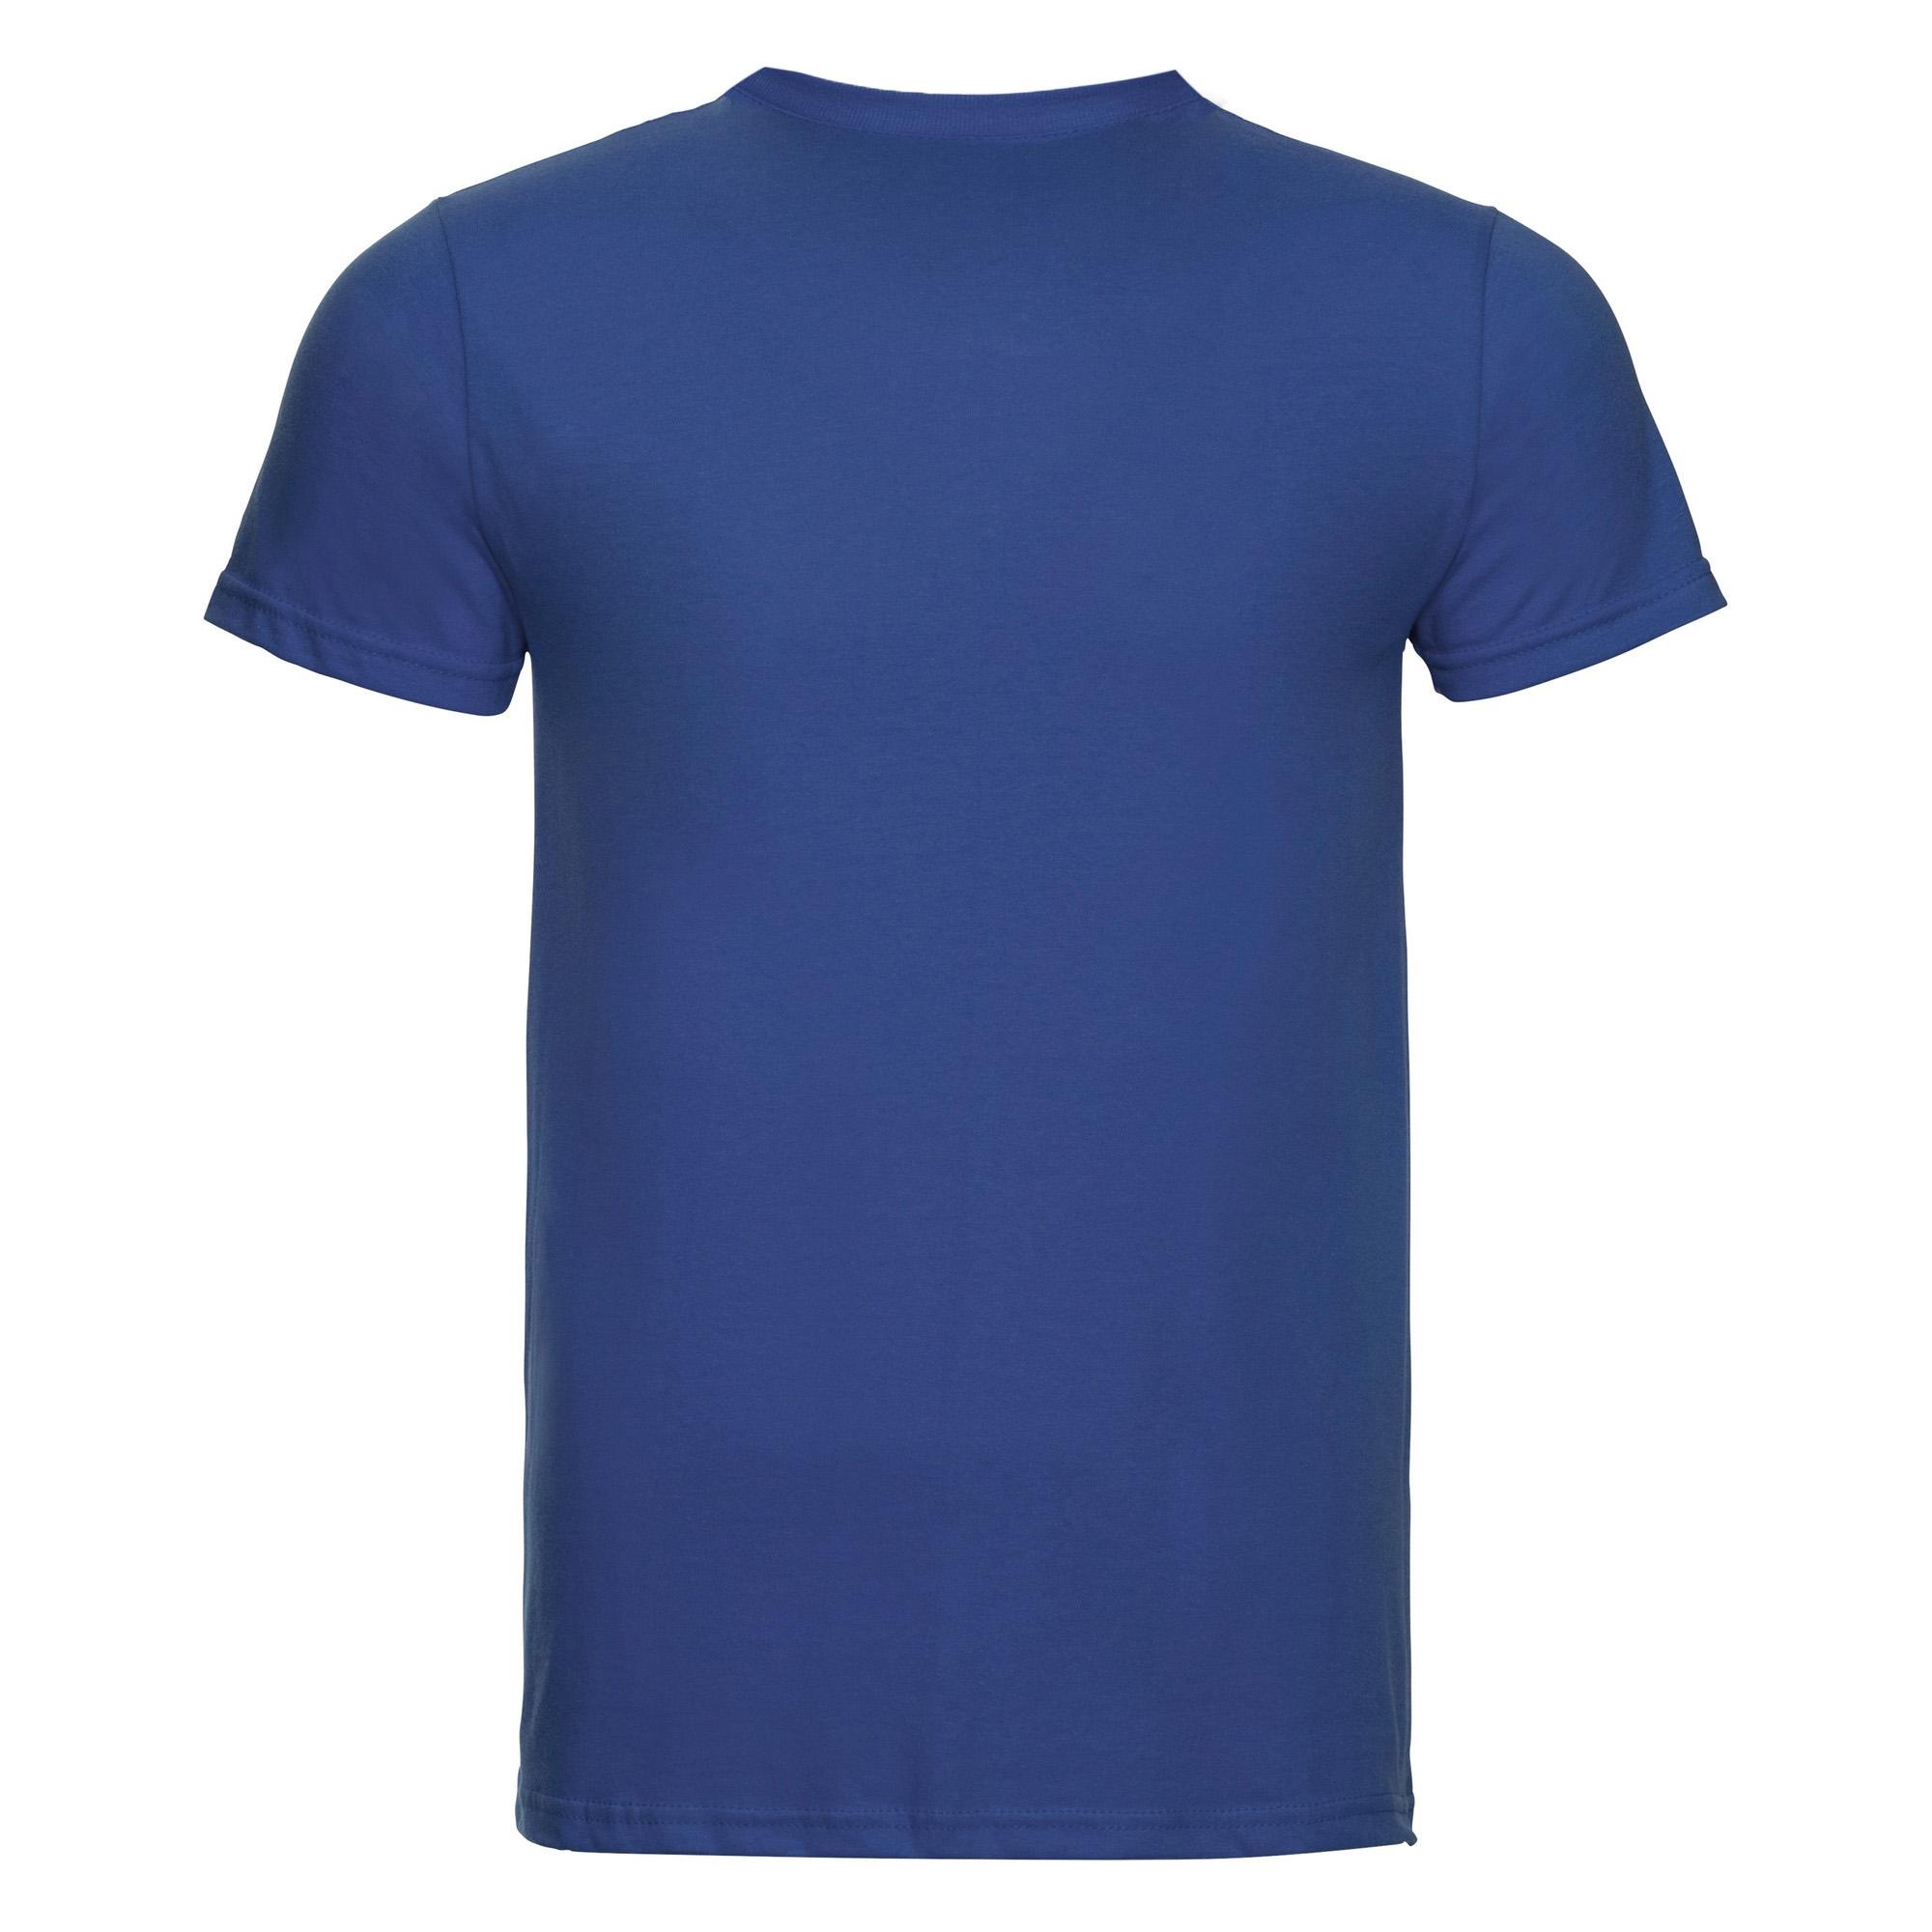 Russell-Mens-Slim-Plain-Blank-100-Cotton-Short-Sleeve-T-Shirt-Tee-BC1515 thumbnail 23